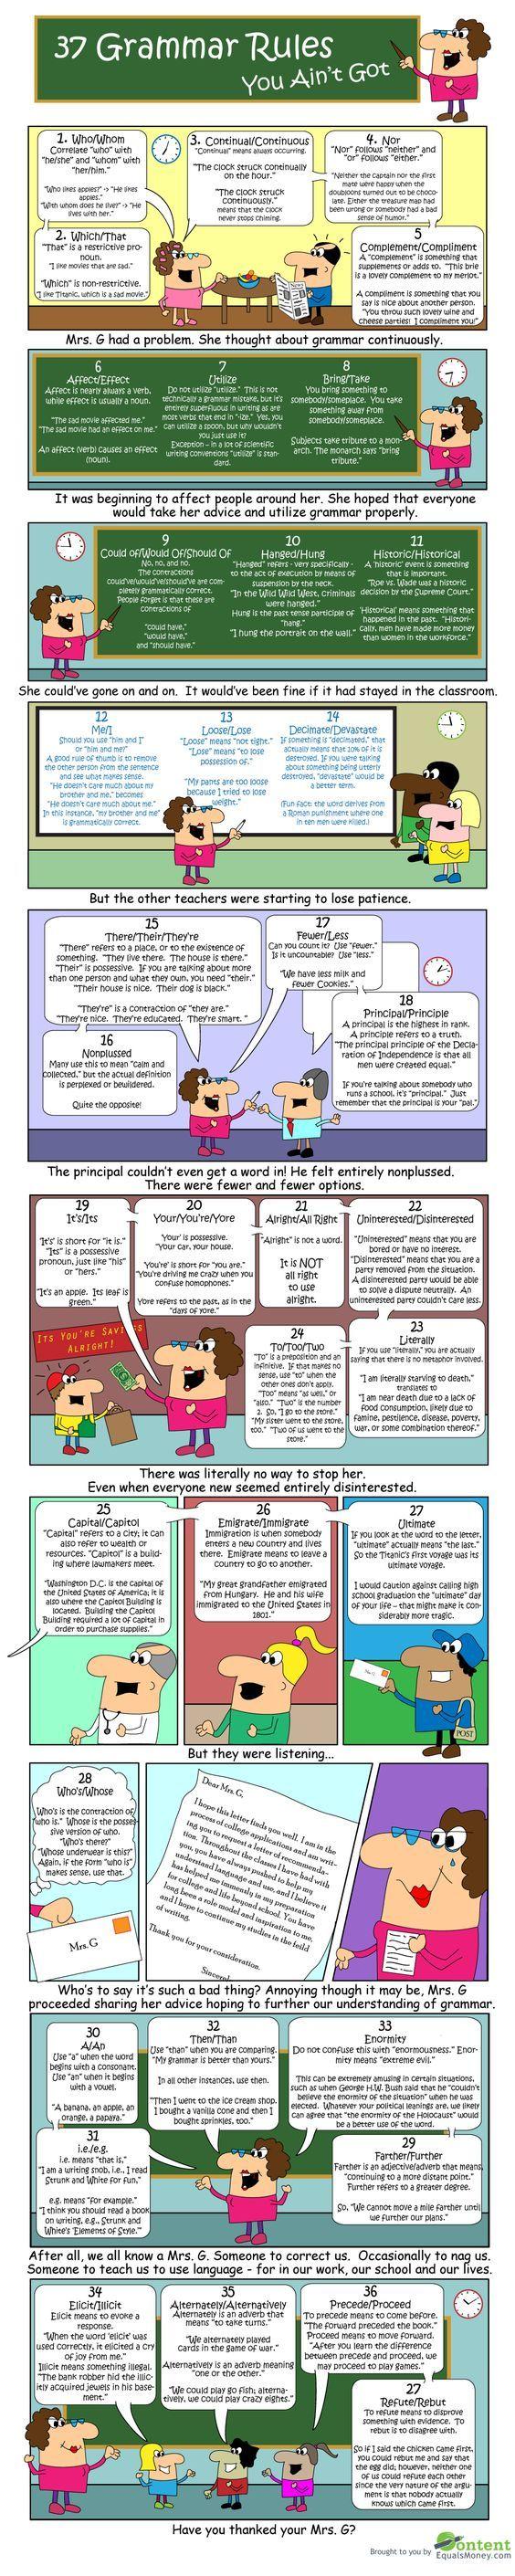 Forum | ________ Learn English | Fluent Land37 Grammar Rules You Ain't Got | Fluent Land